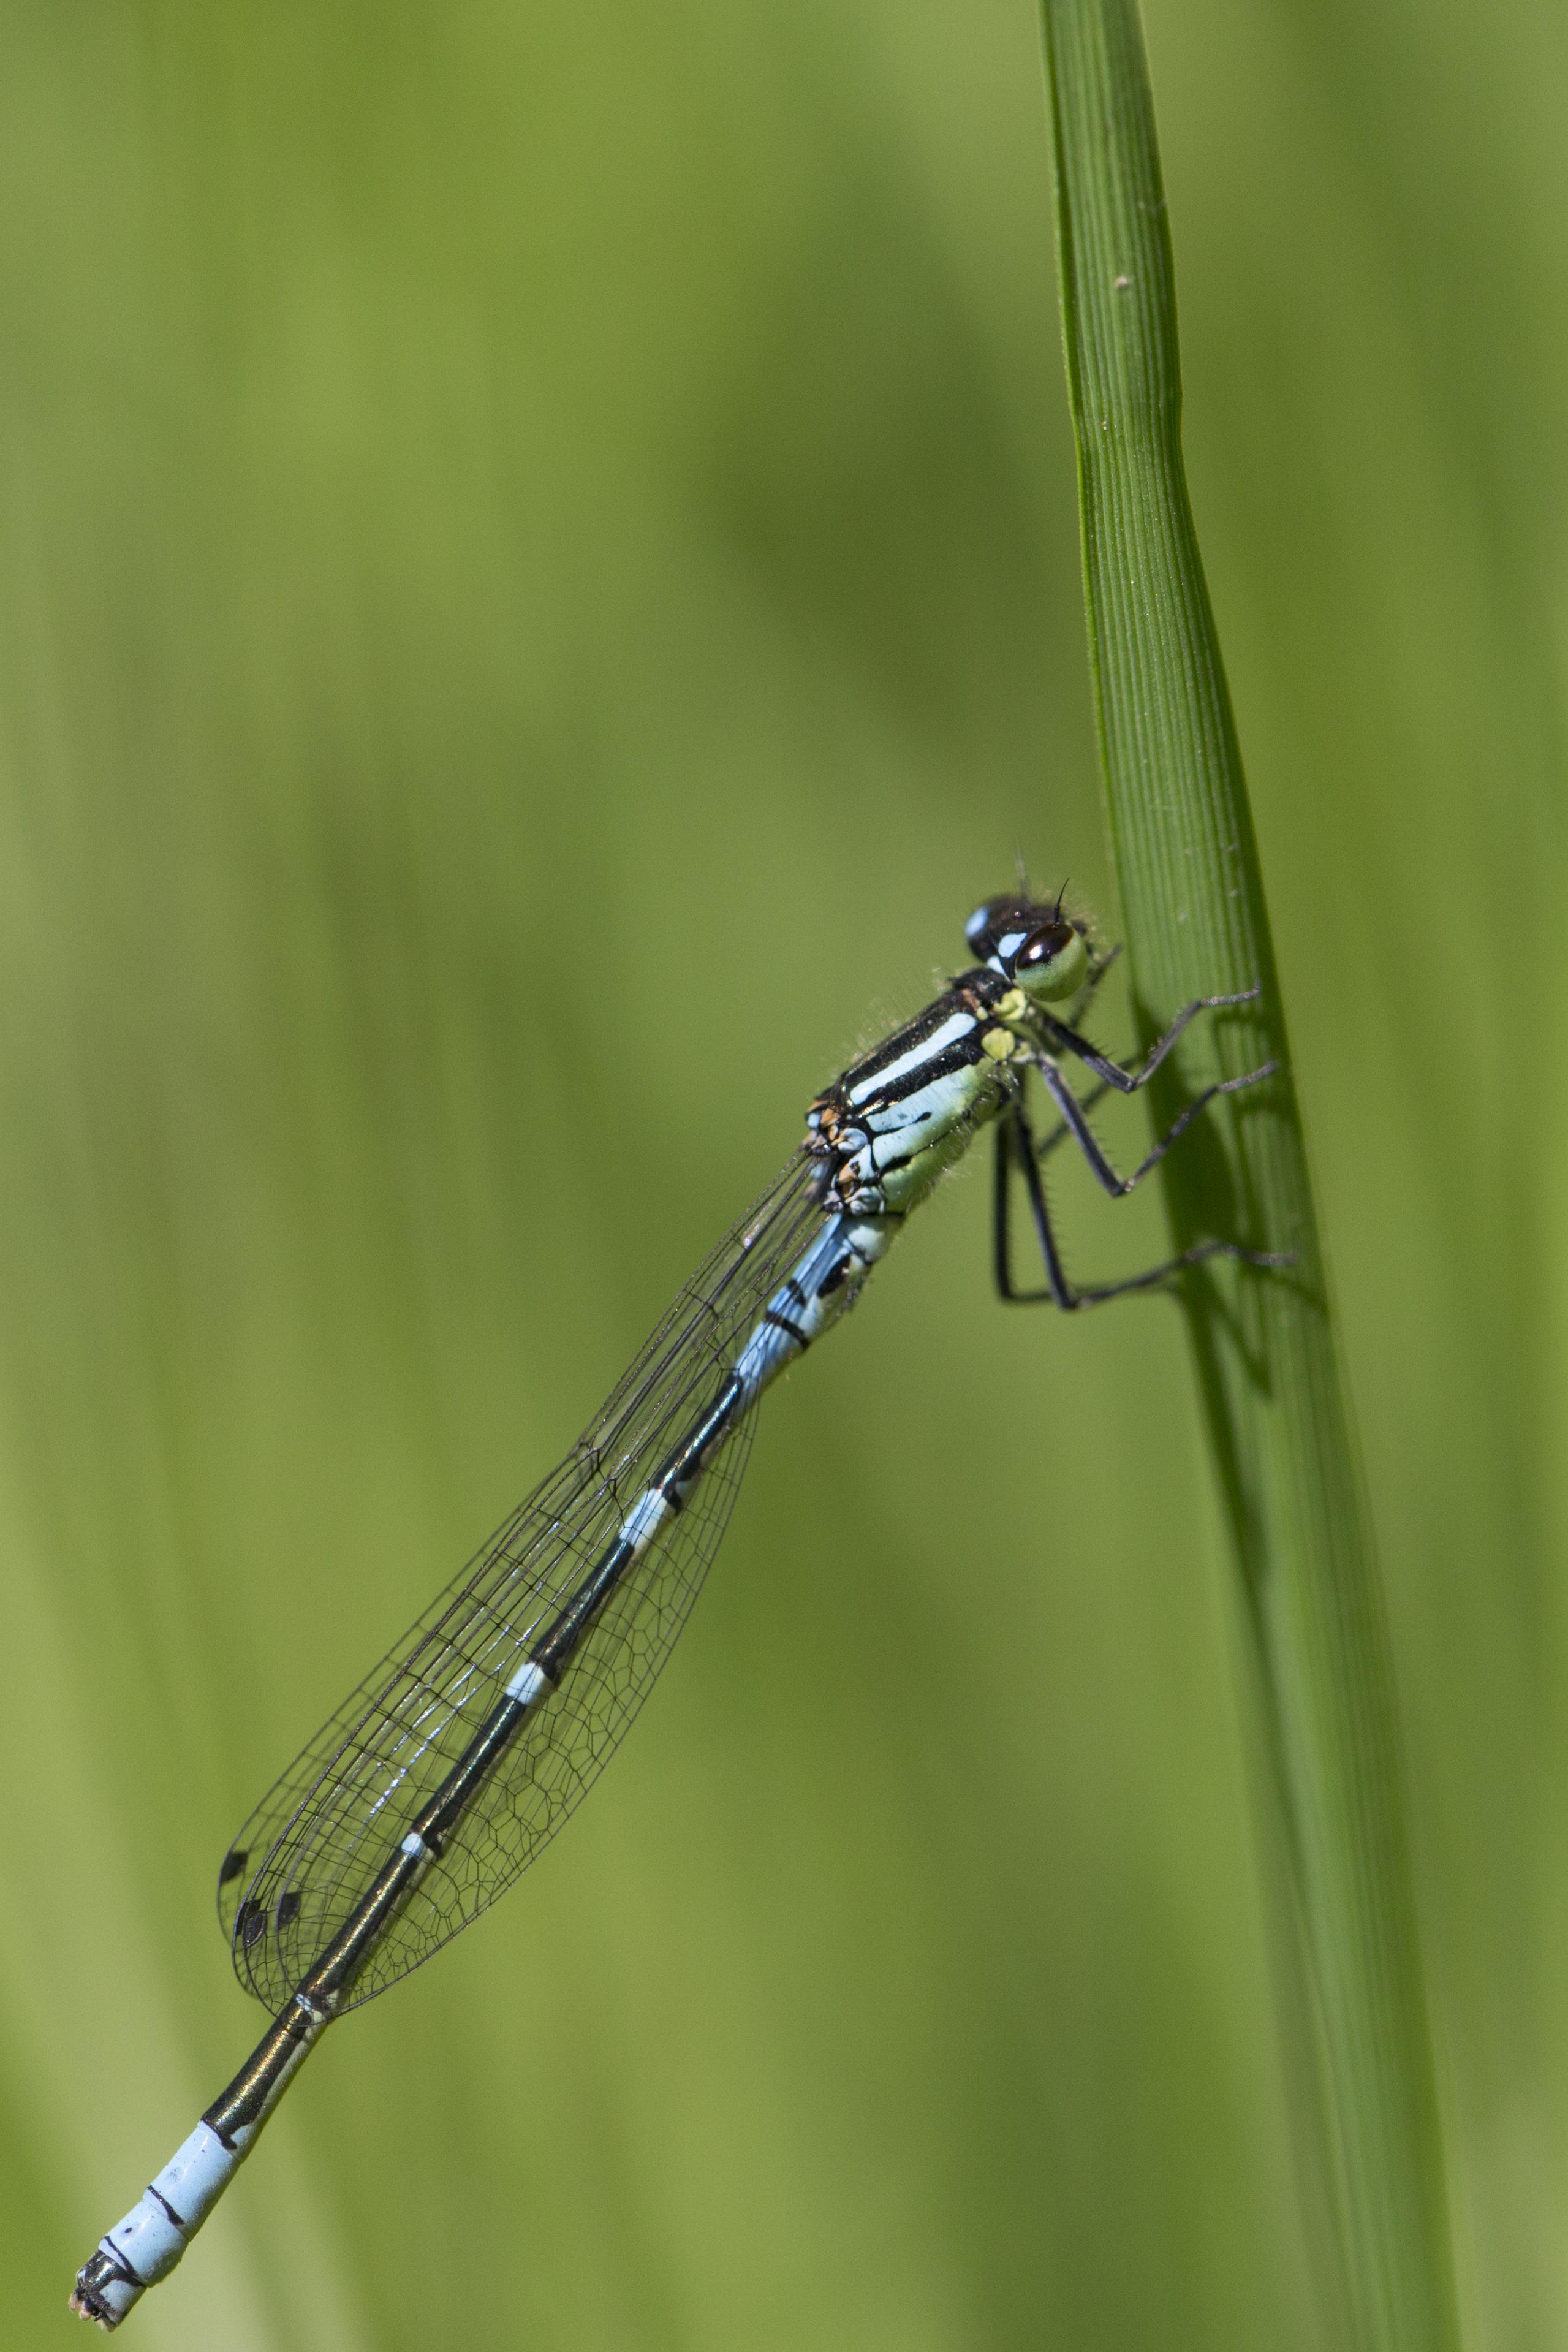 File:Coenagrion lunulatum, Maanwaterjuffer, Crescent Bluet 01.jpg -  Wikimedia Commons